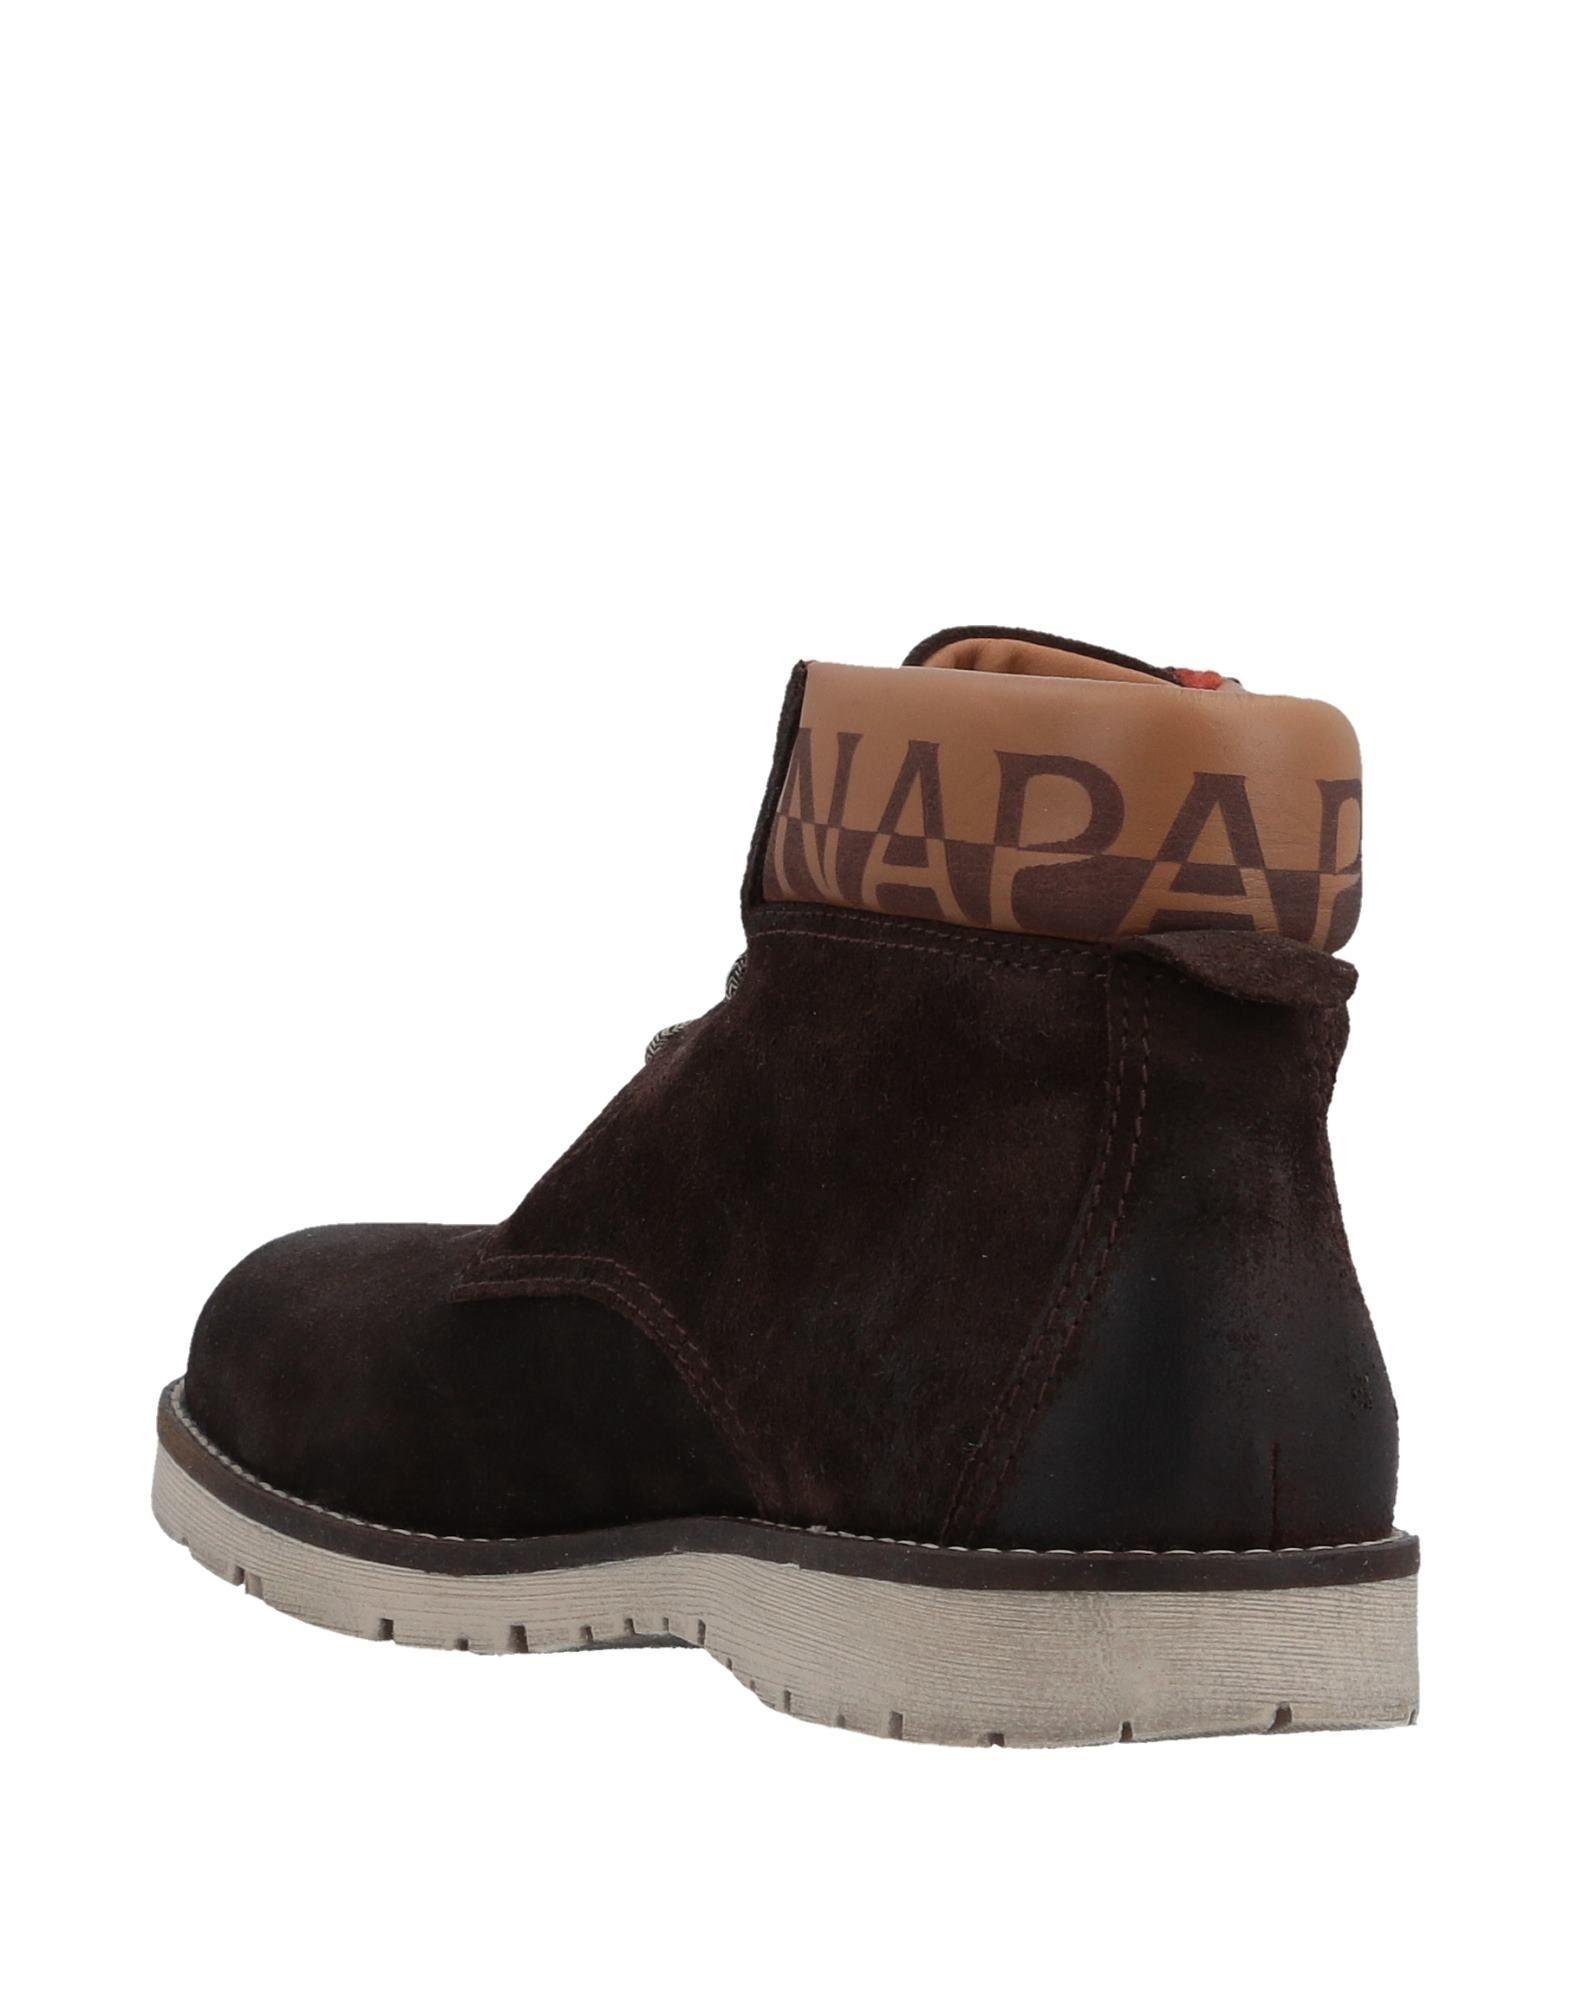 Napapijri Stiefelette Herren  11509516FS Heiße Heiße Heiße Schuhe 0e548b